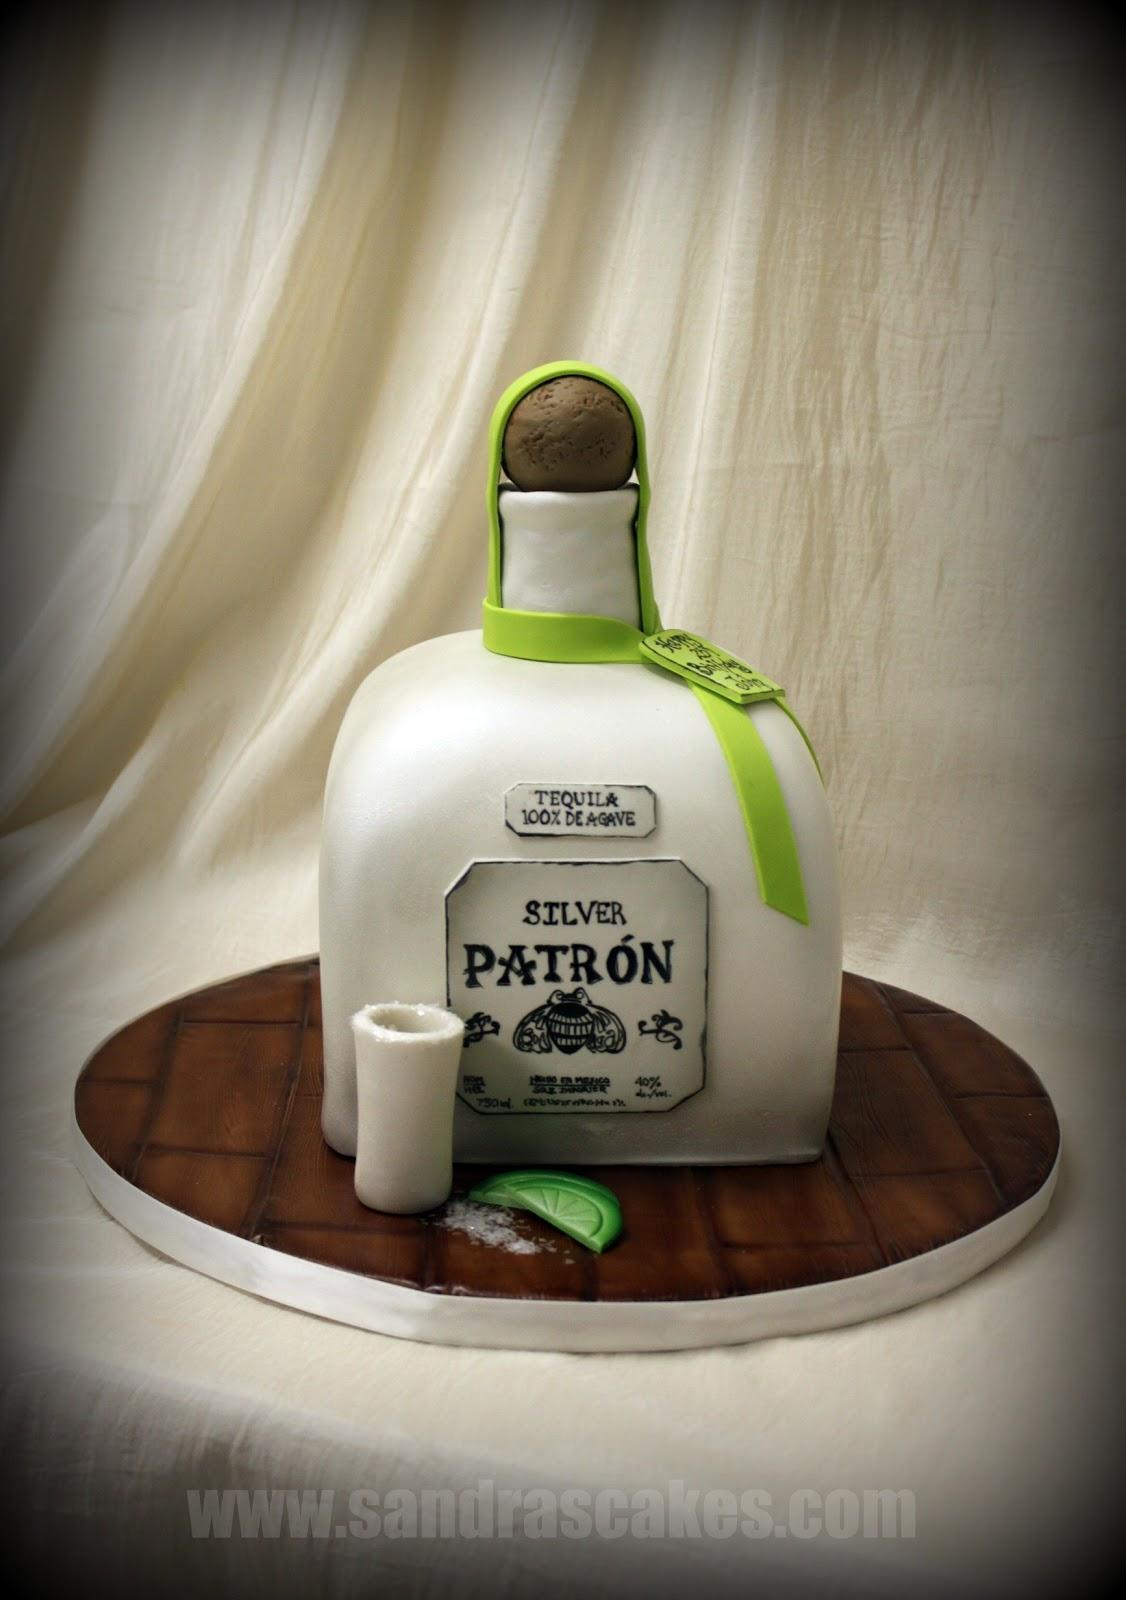 On Birthday Cakes Patron Bottle Cake